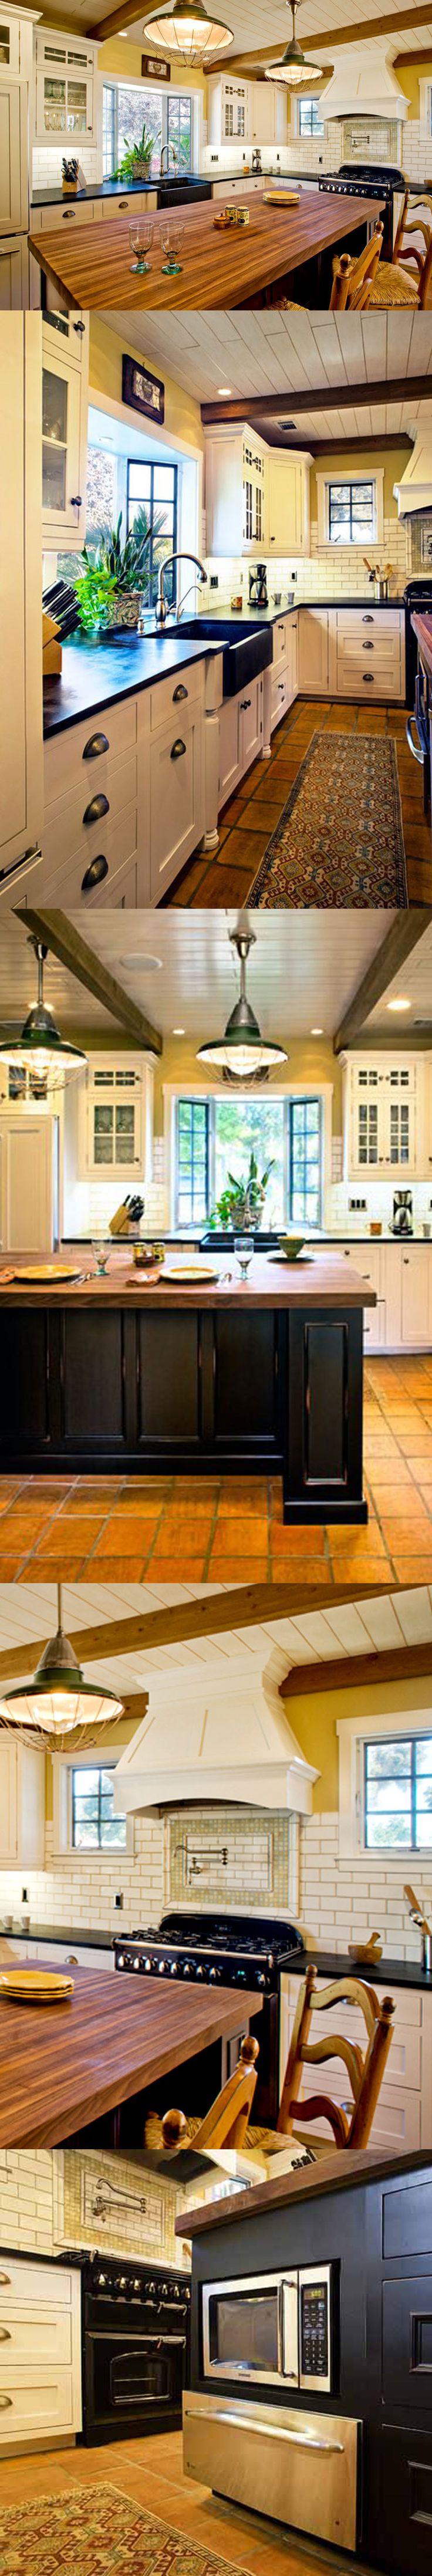 White apron galleria 7 - White Traditional Cottage Kitchen With Wood Countertop Kitchen Island And Subway Tile Backsplash Apron Sink